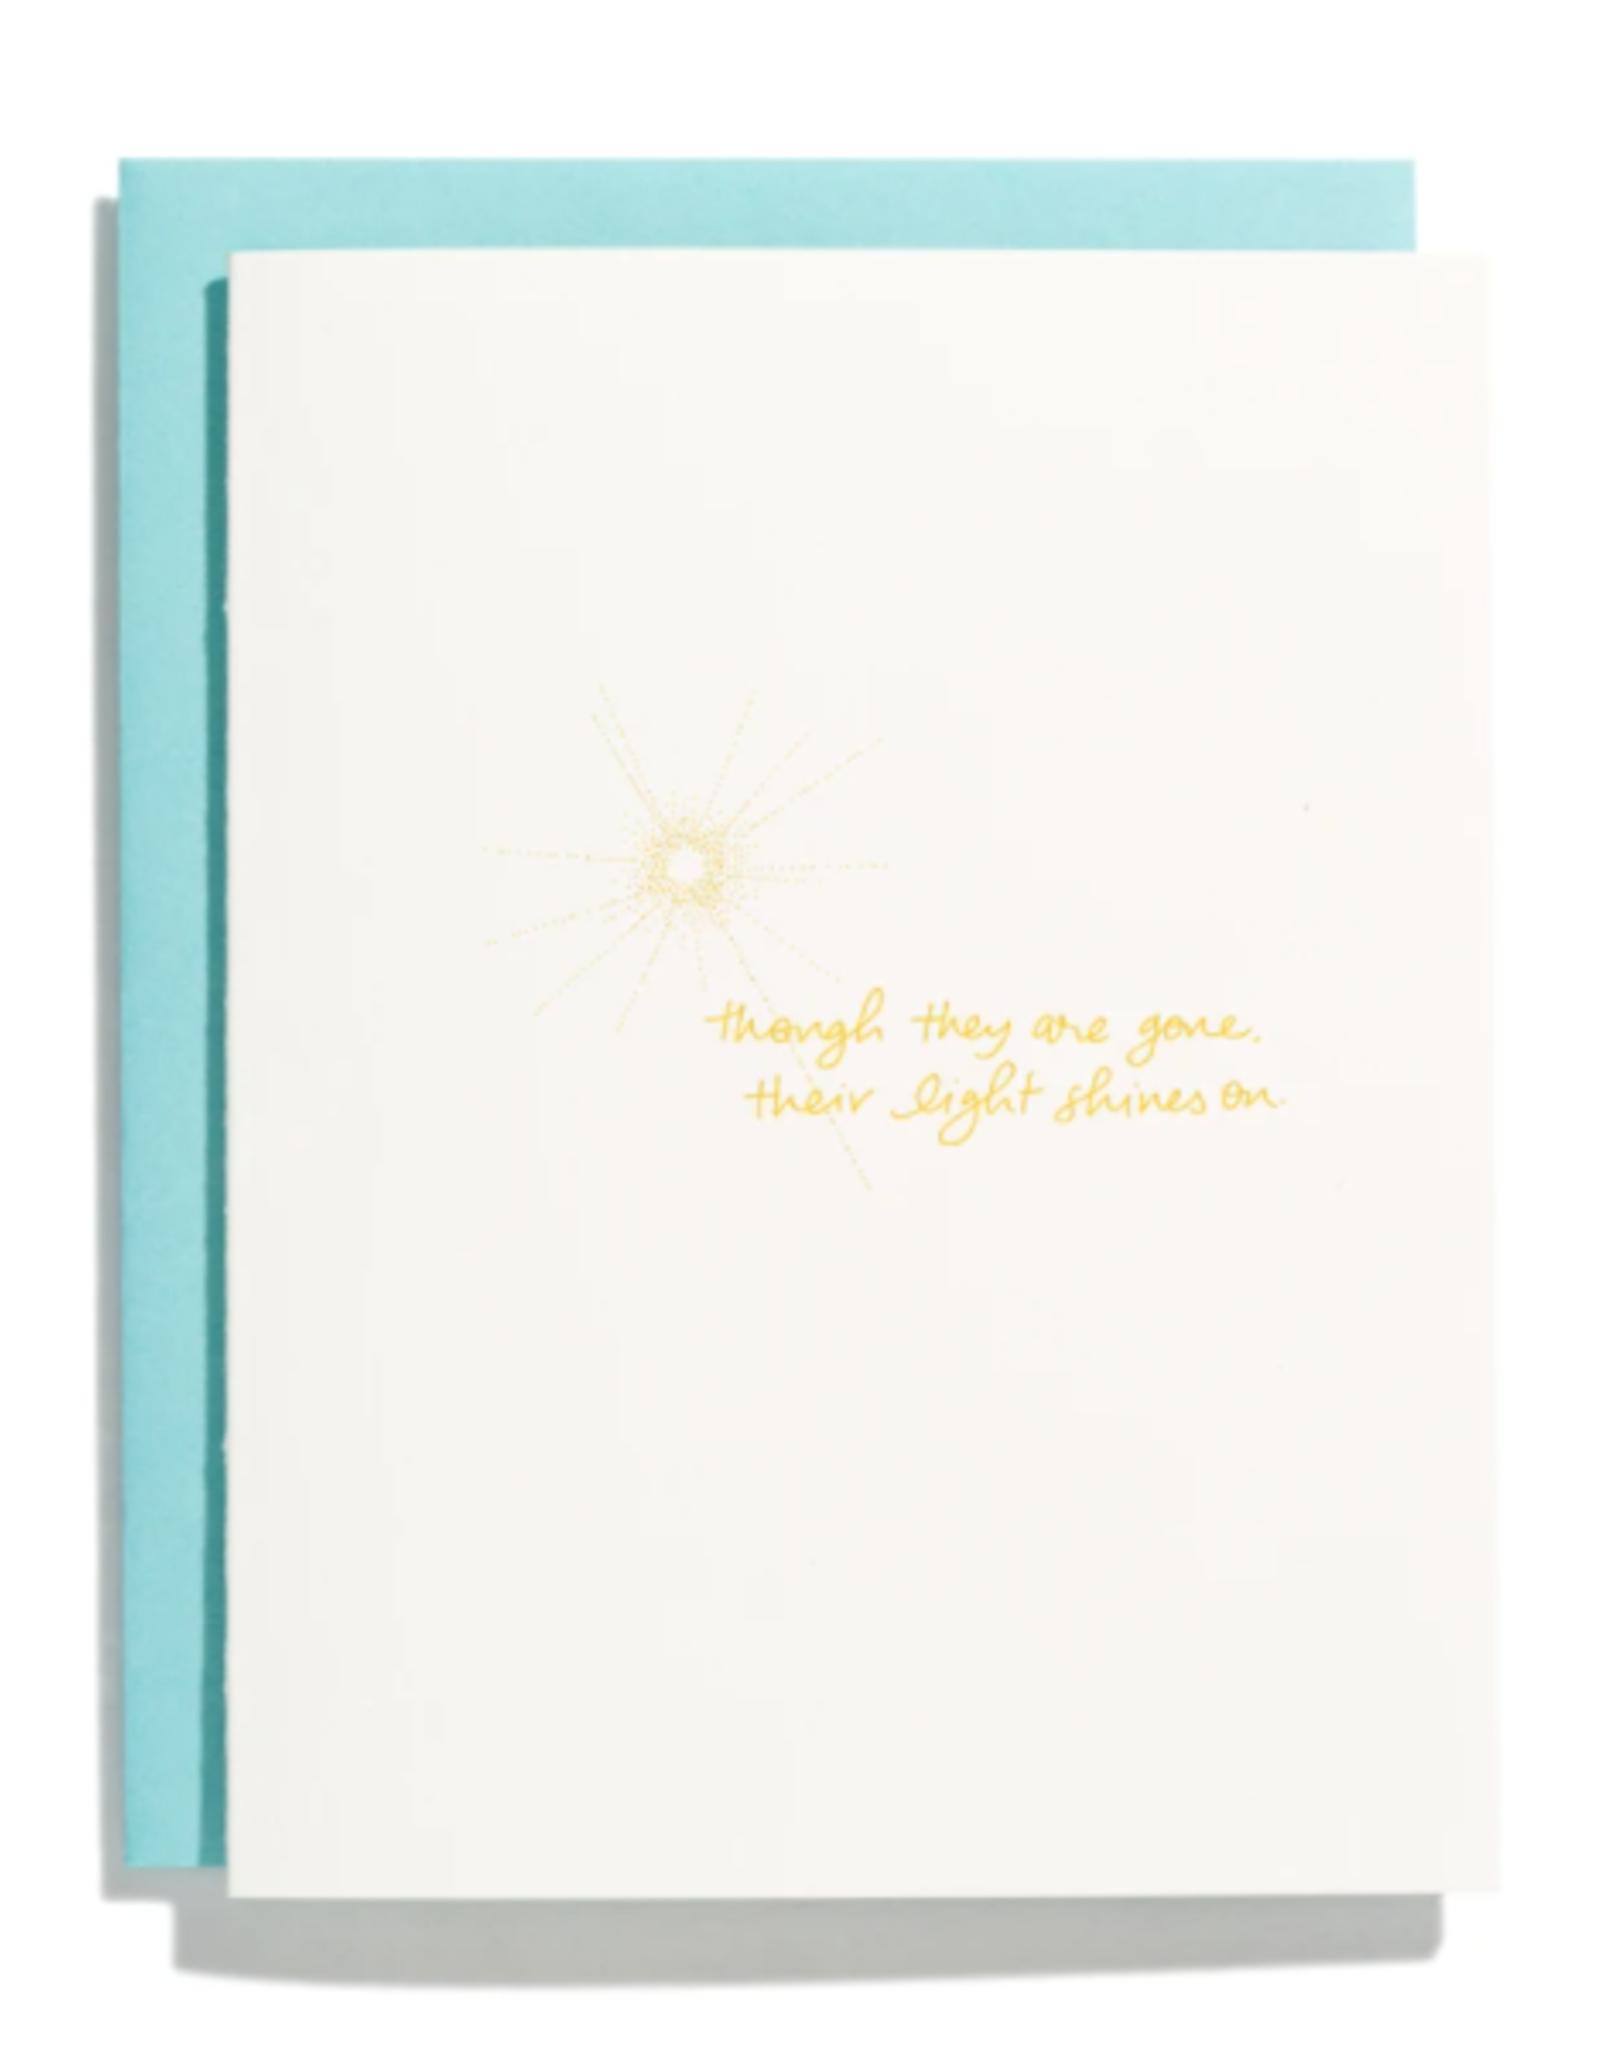 Light Shines On Card